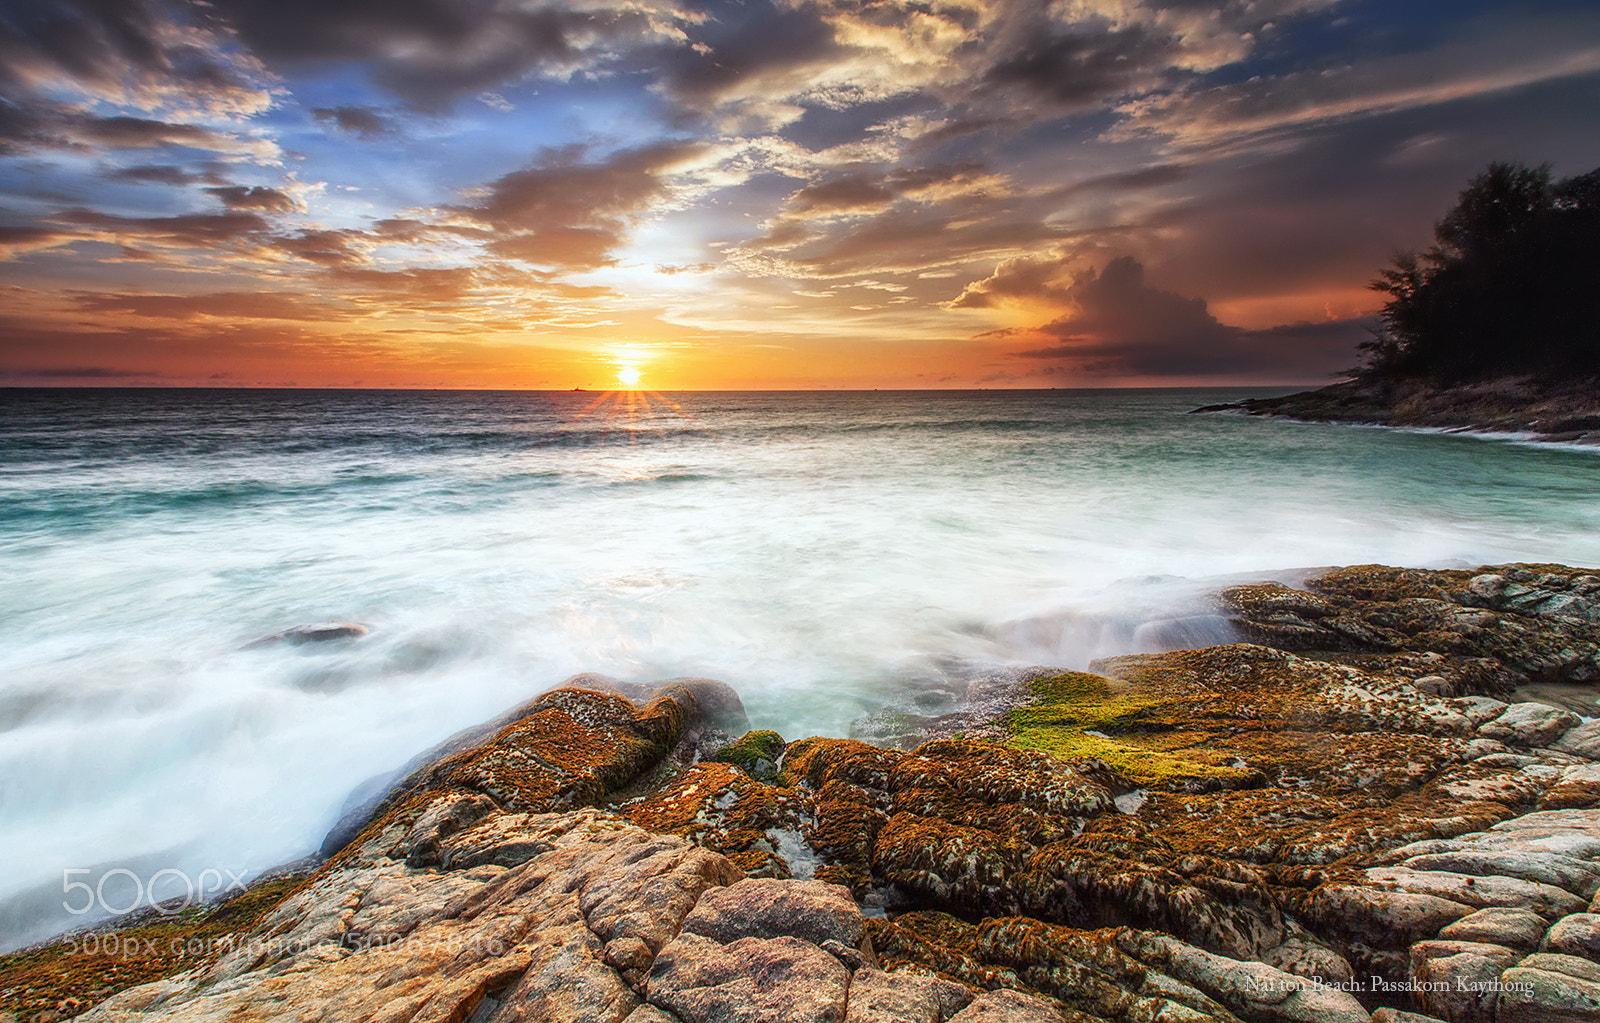 Photograph Naiton Beach by Wazabi Bomb Bomb on 500px